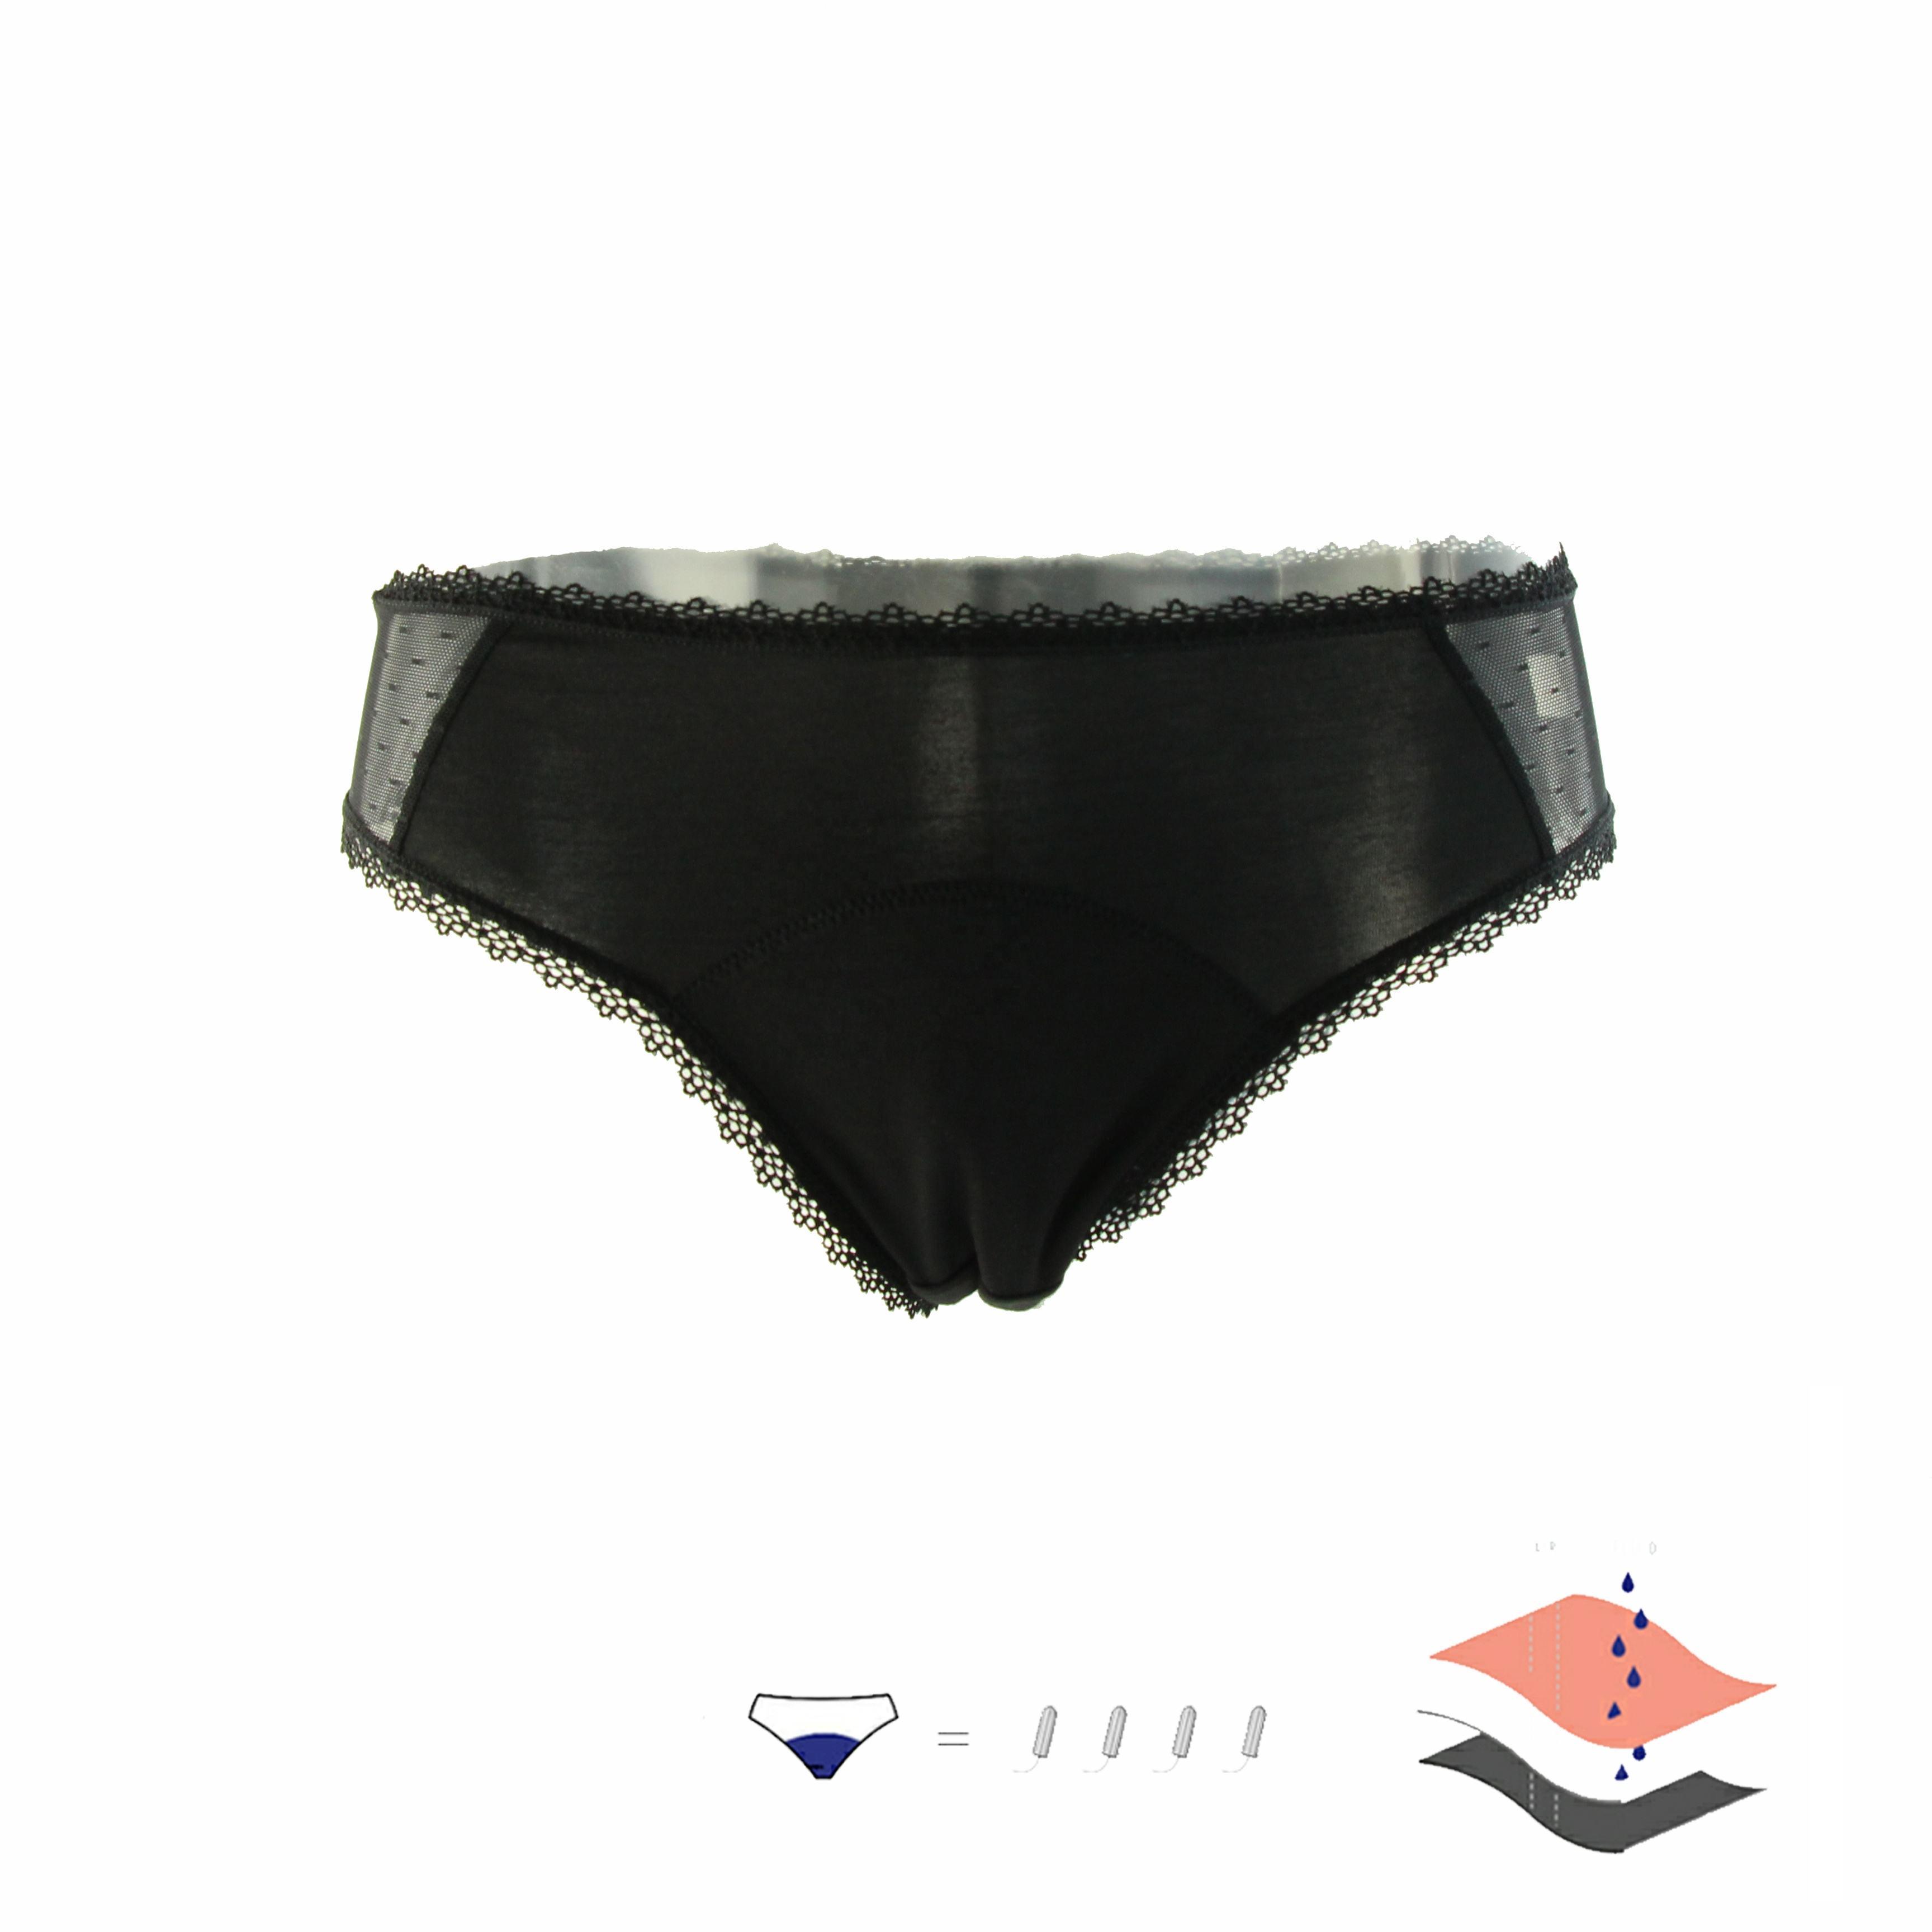 NEU 4-20 Damen Slip Slips Unterwäsche Pants panties Hotpants Dessous Panty Tanga